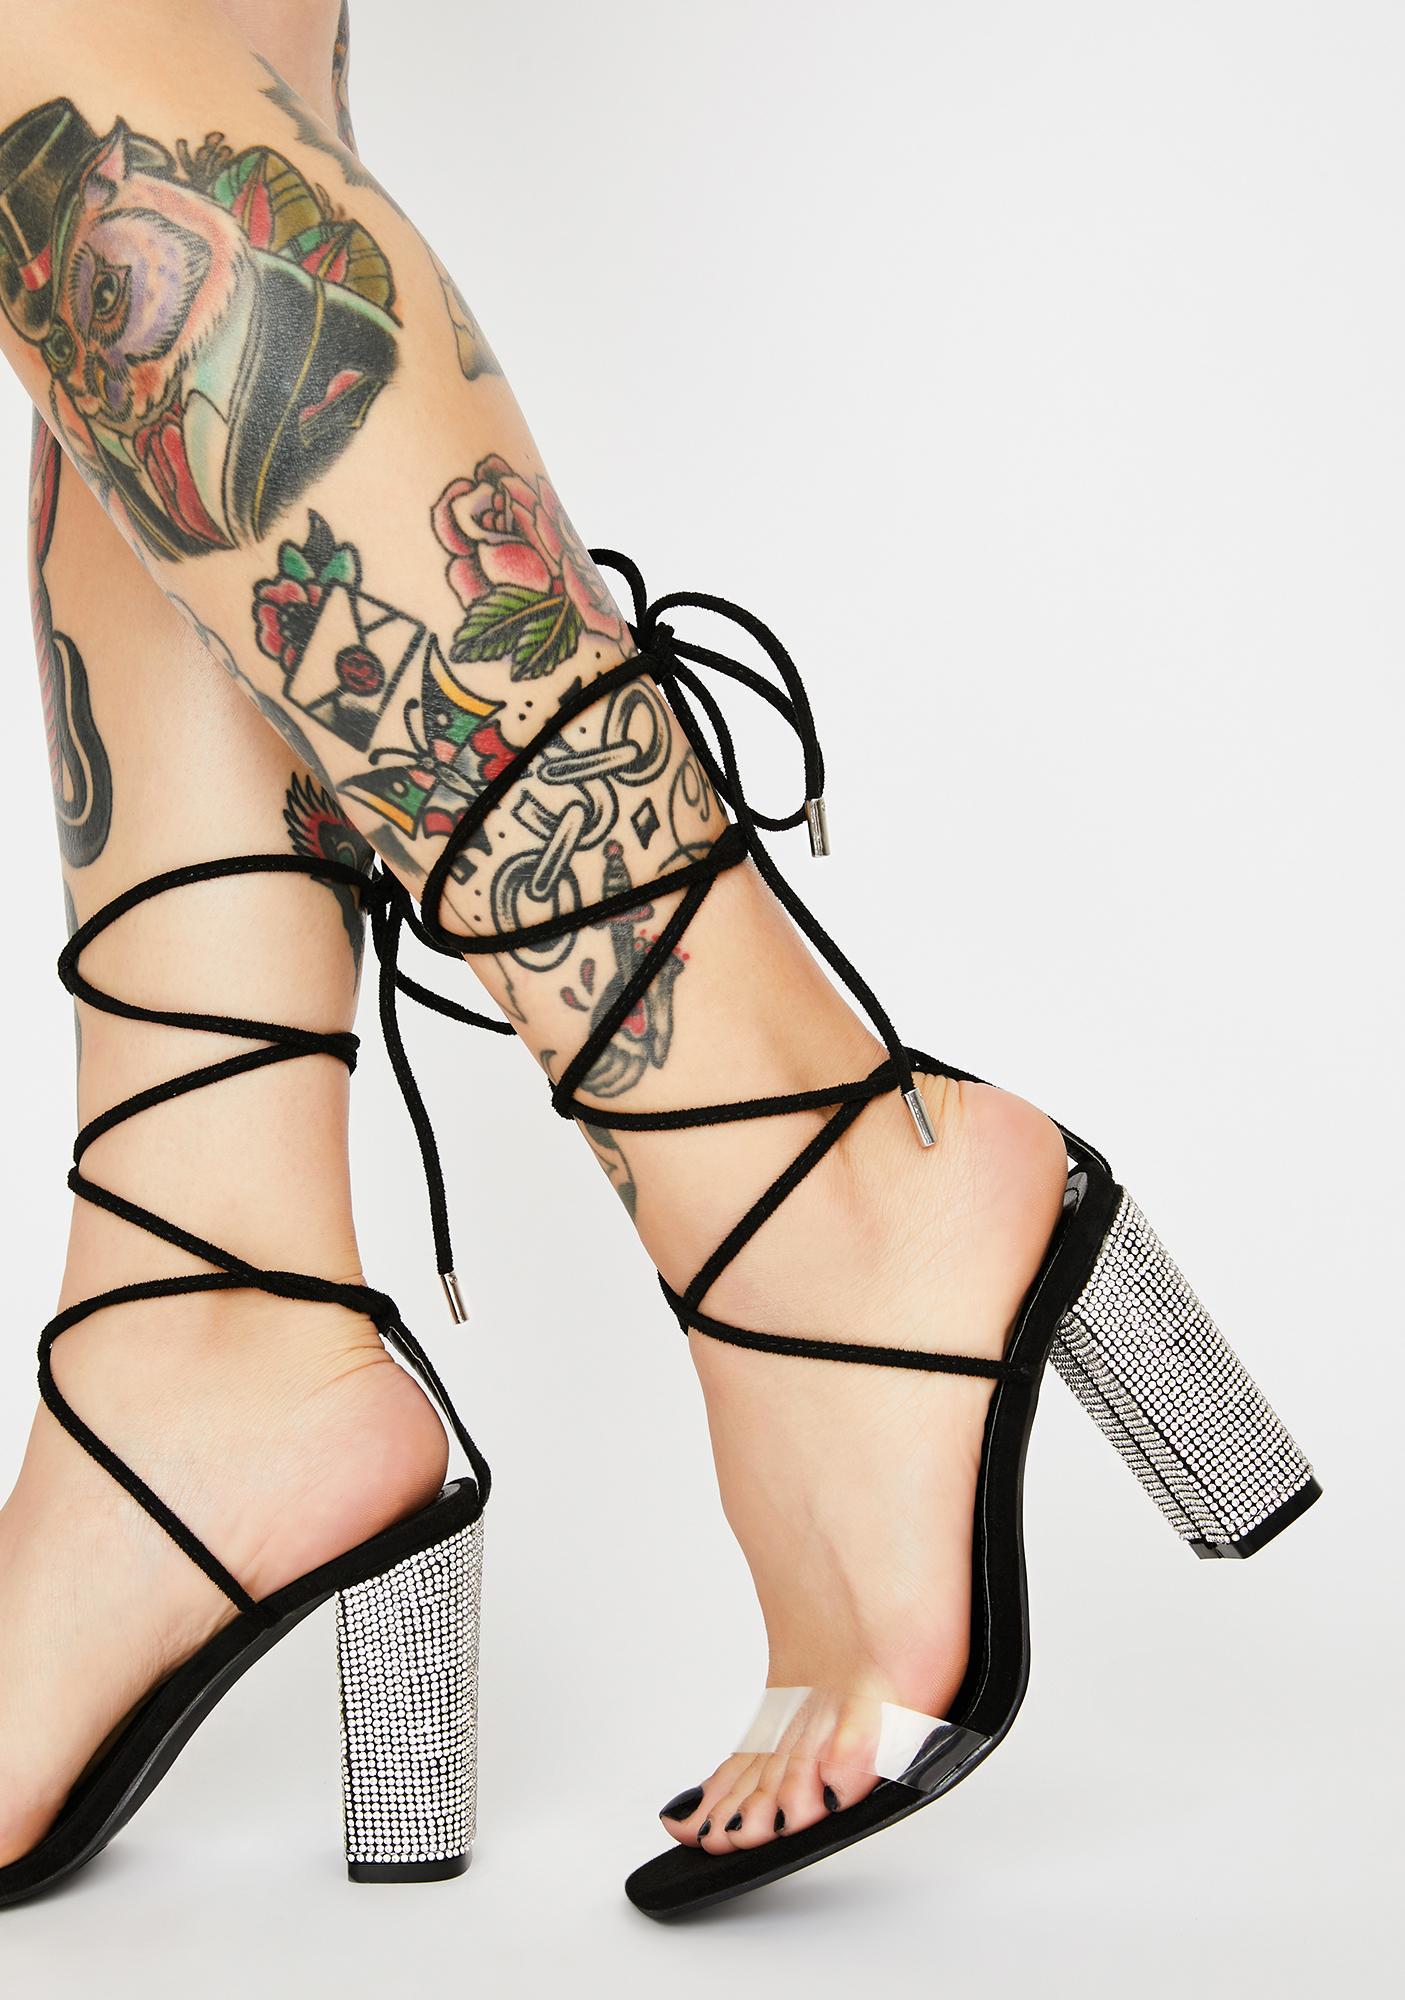 Backstage Pass Wrap Heels